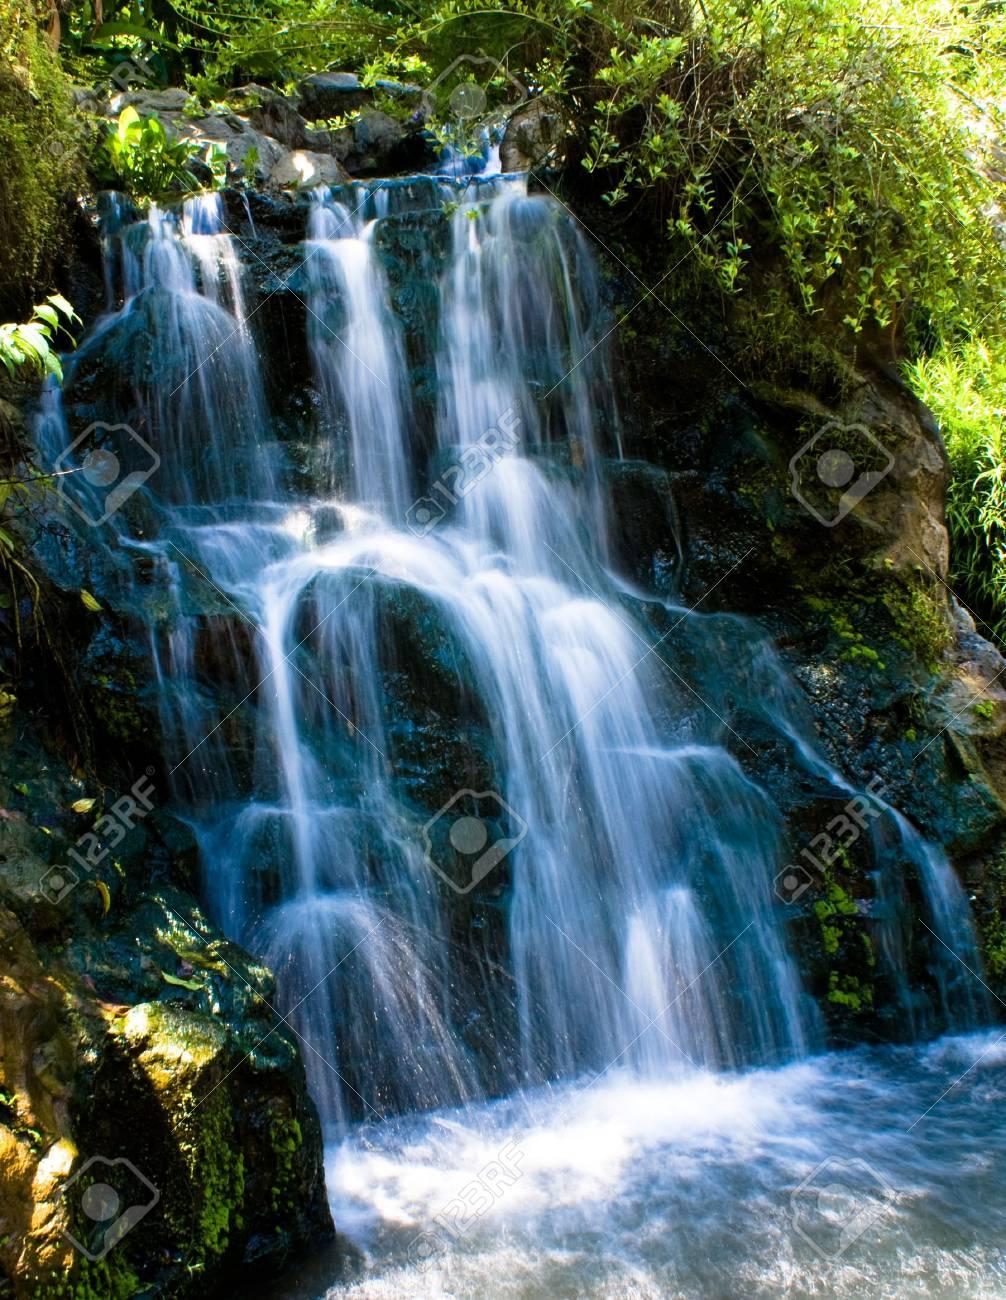 Relaxing landscaping waterfall in a green tropicl botanic garden - 3411735